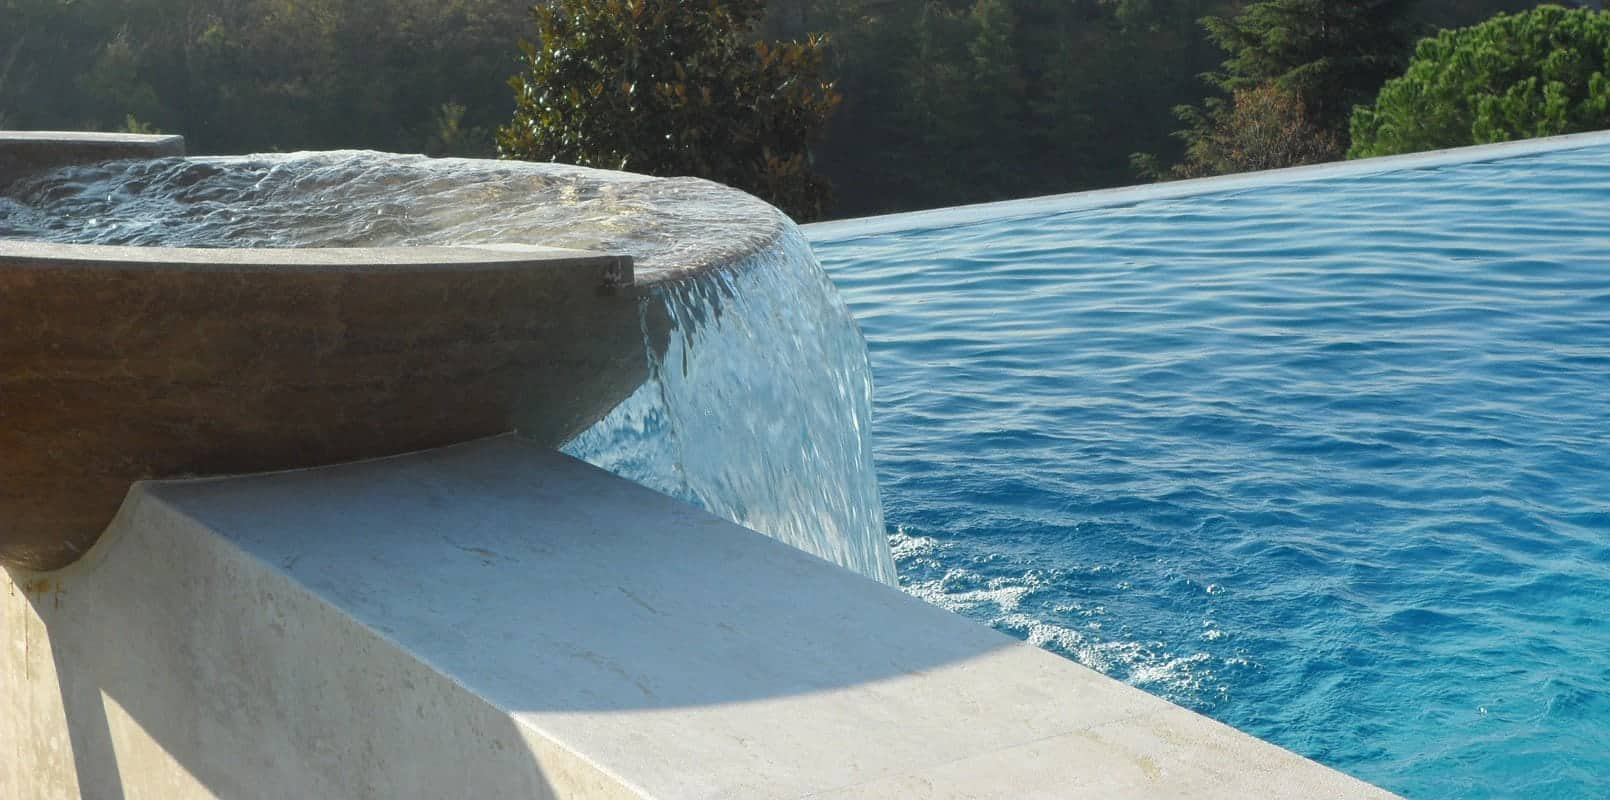 Veneta marmi marmo travertino marmi - Fontana per piscina ...